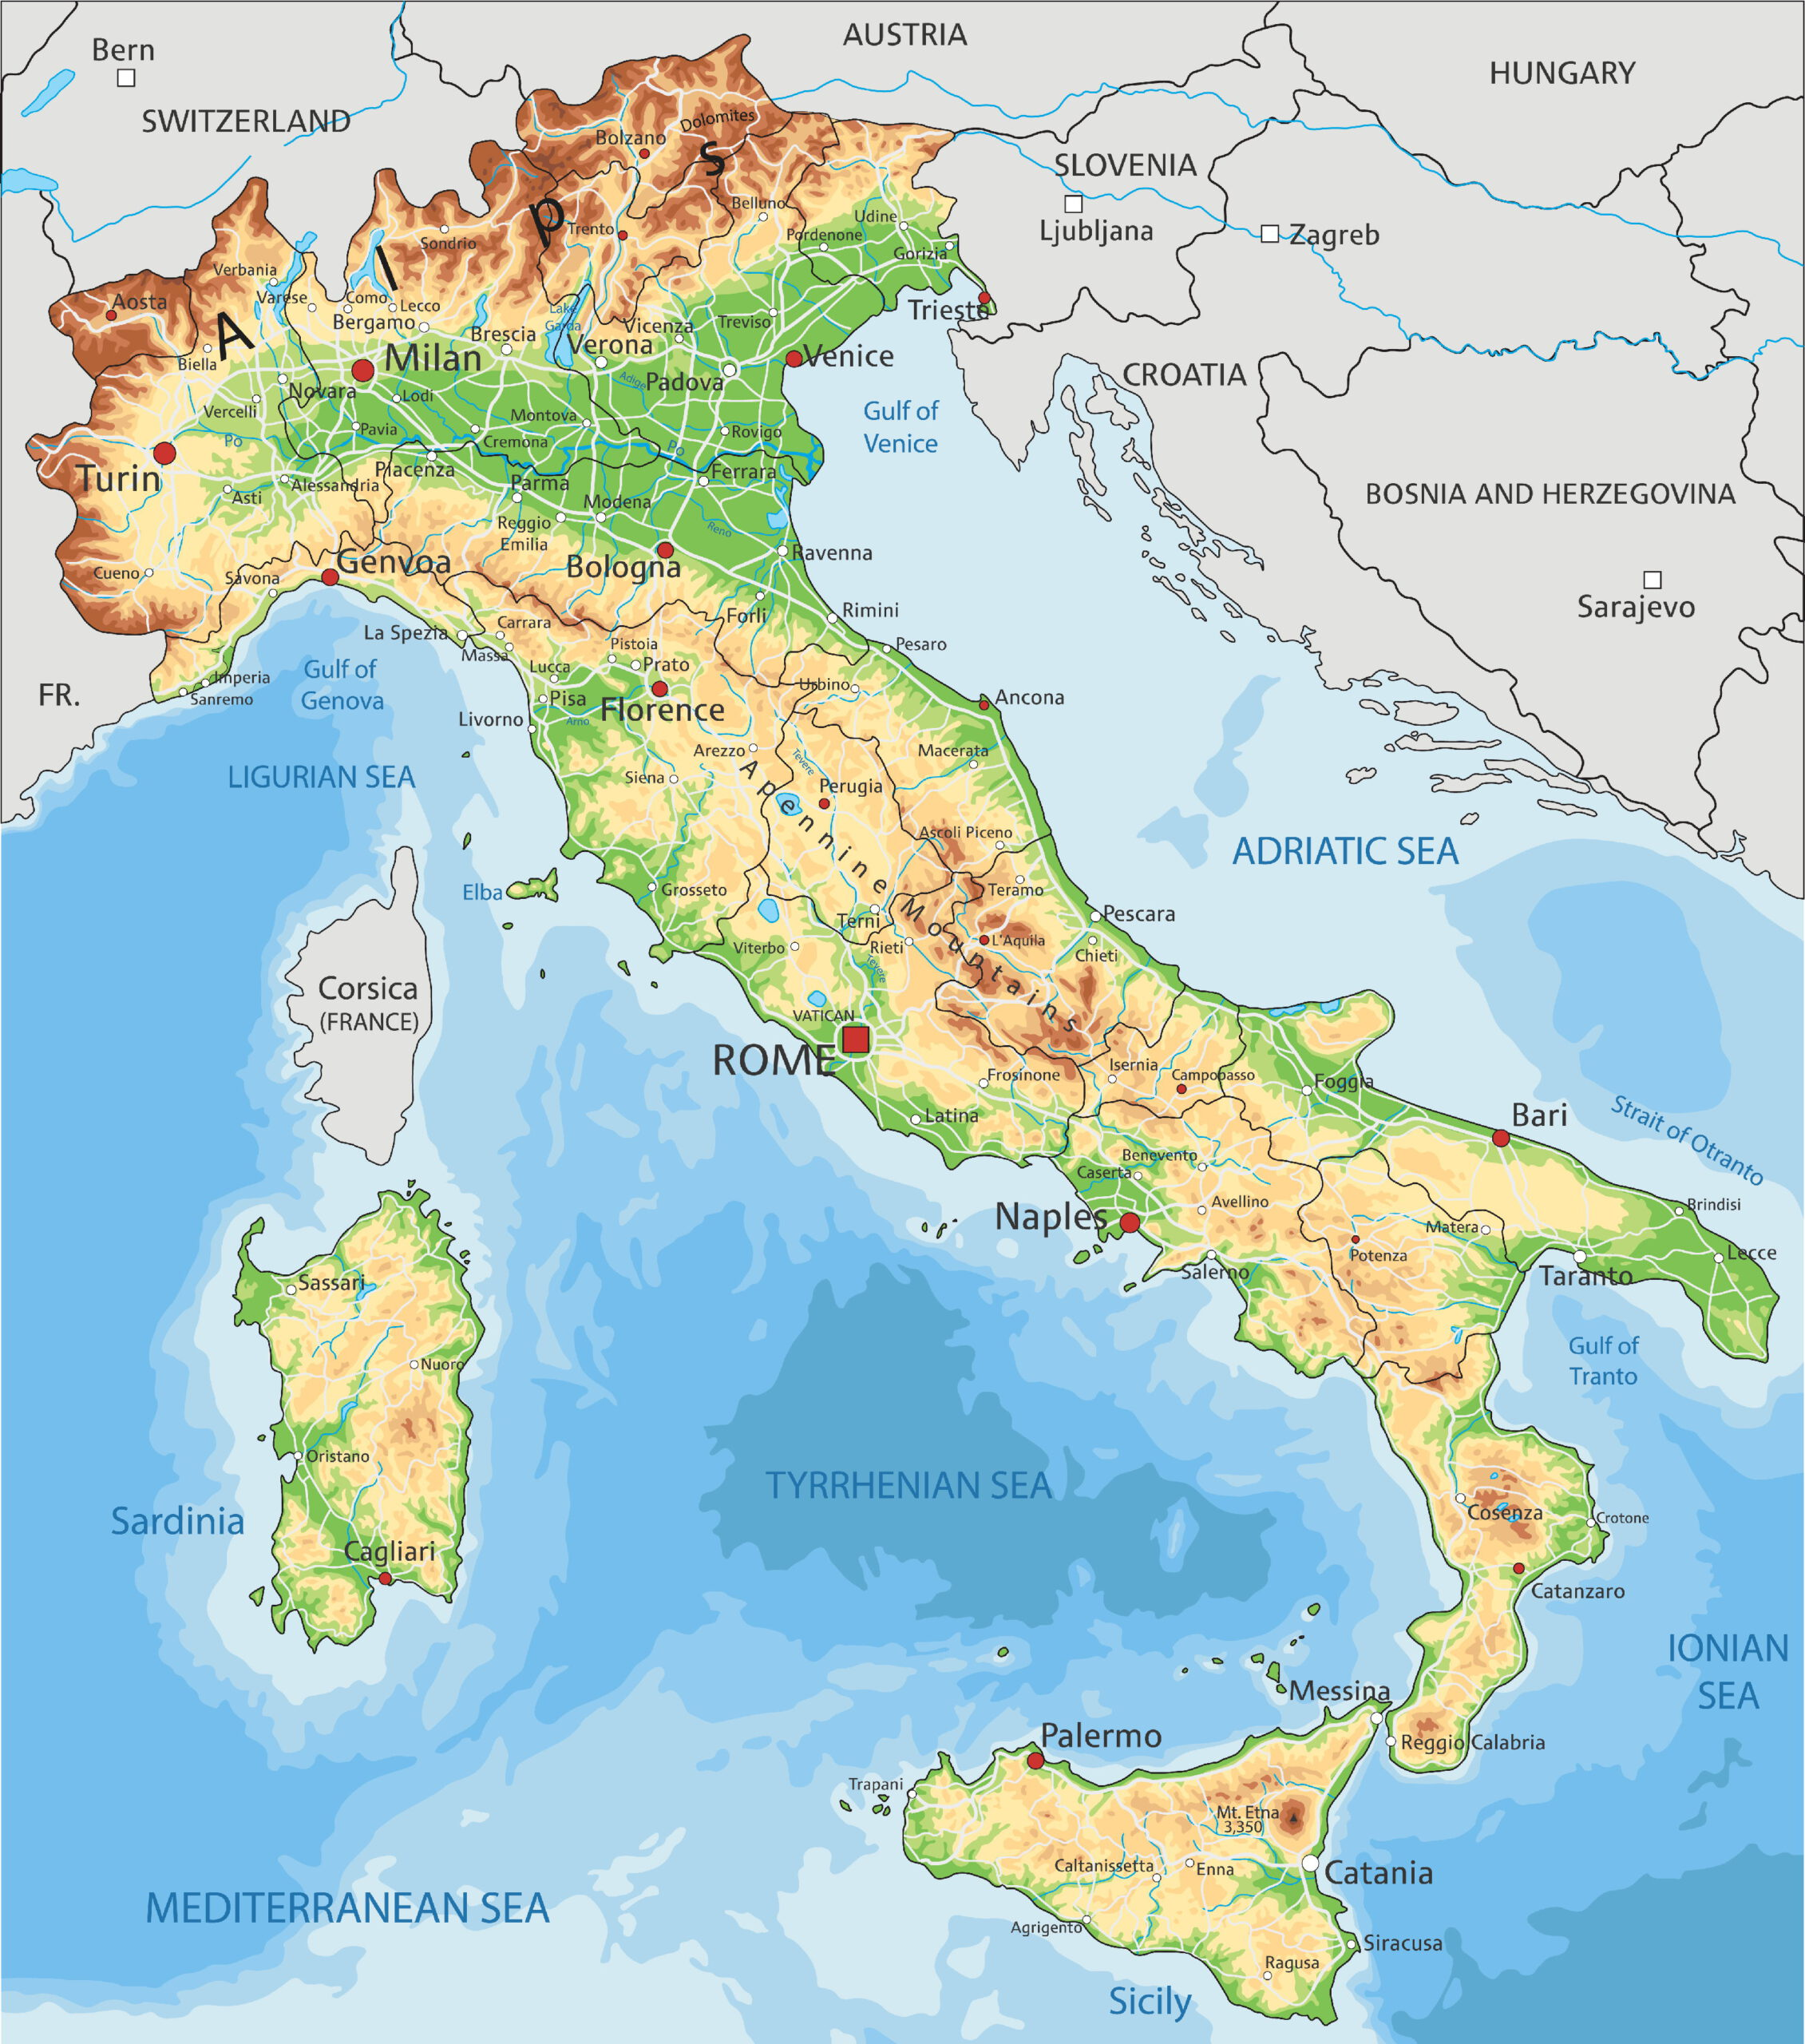 Mapy Italie Vyber 10 Nejlepsich Zdarma Ke Stazeni